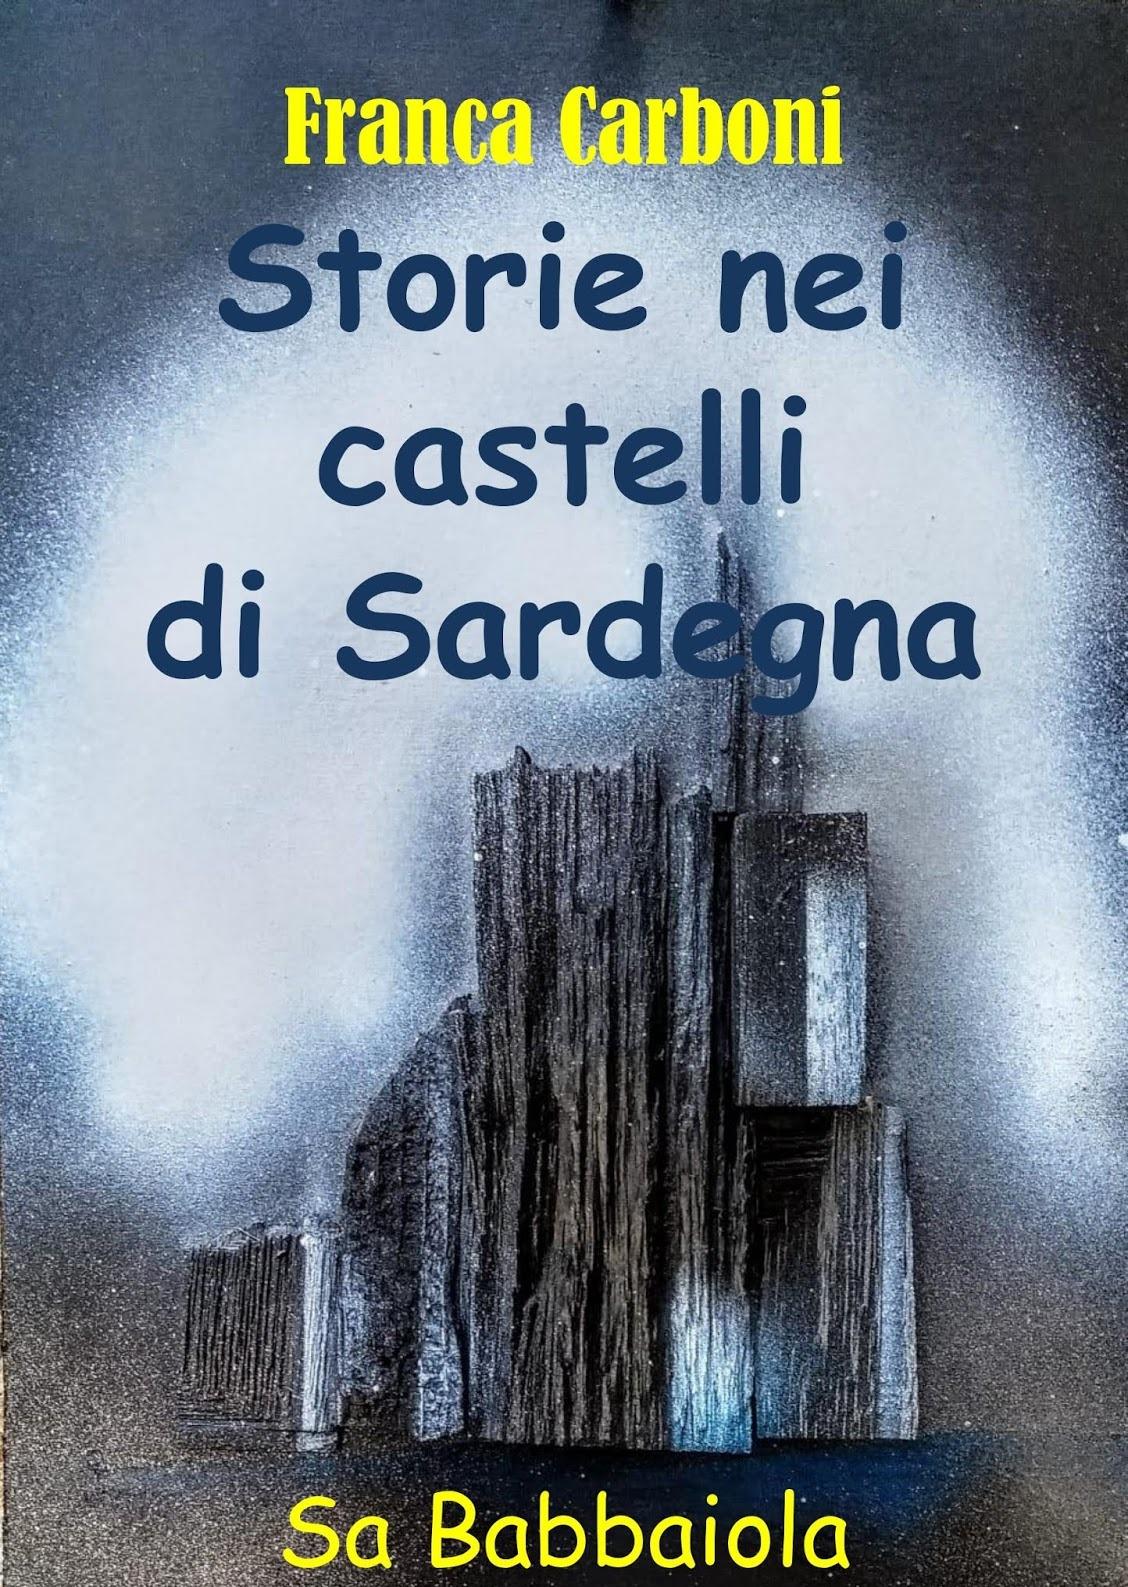 Storie nei castelli di Sardegna